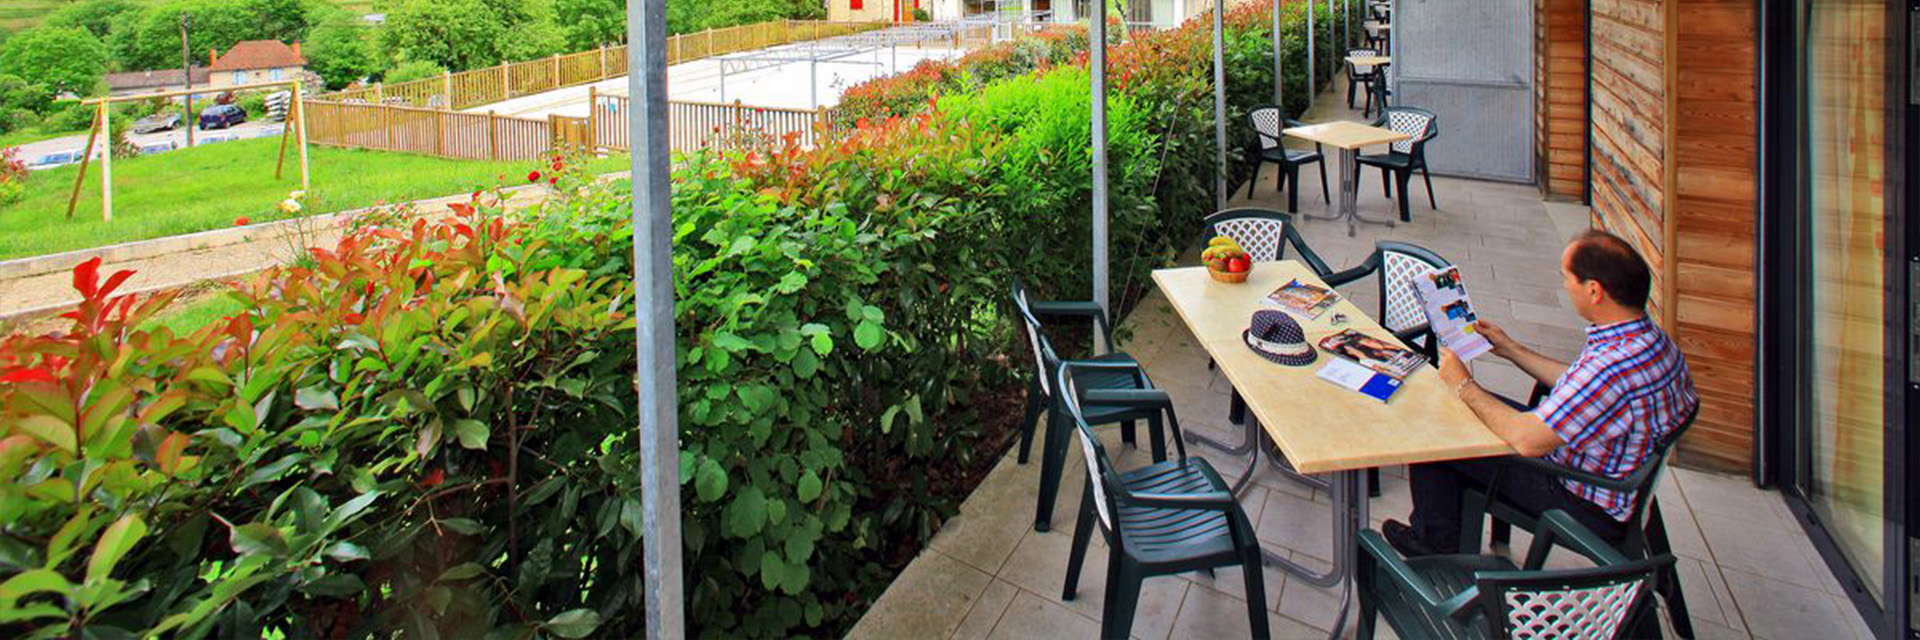 Village_club_vacances_périgord-quercy-terrou-terrasse